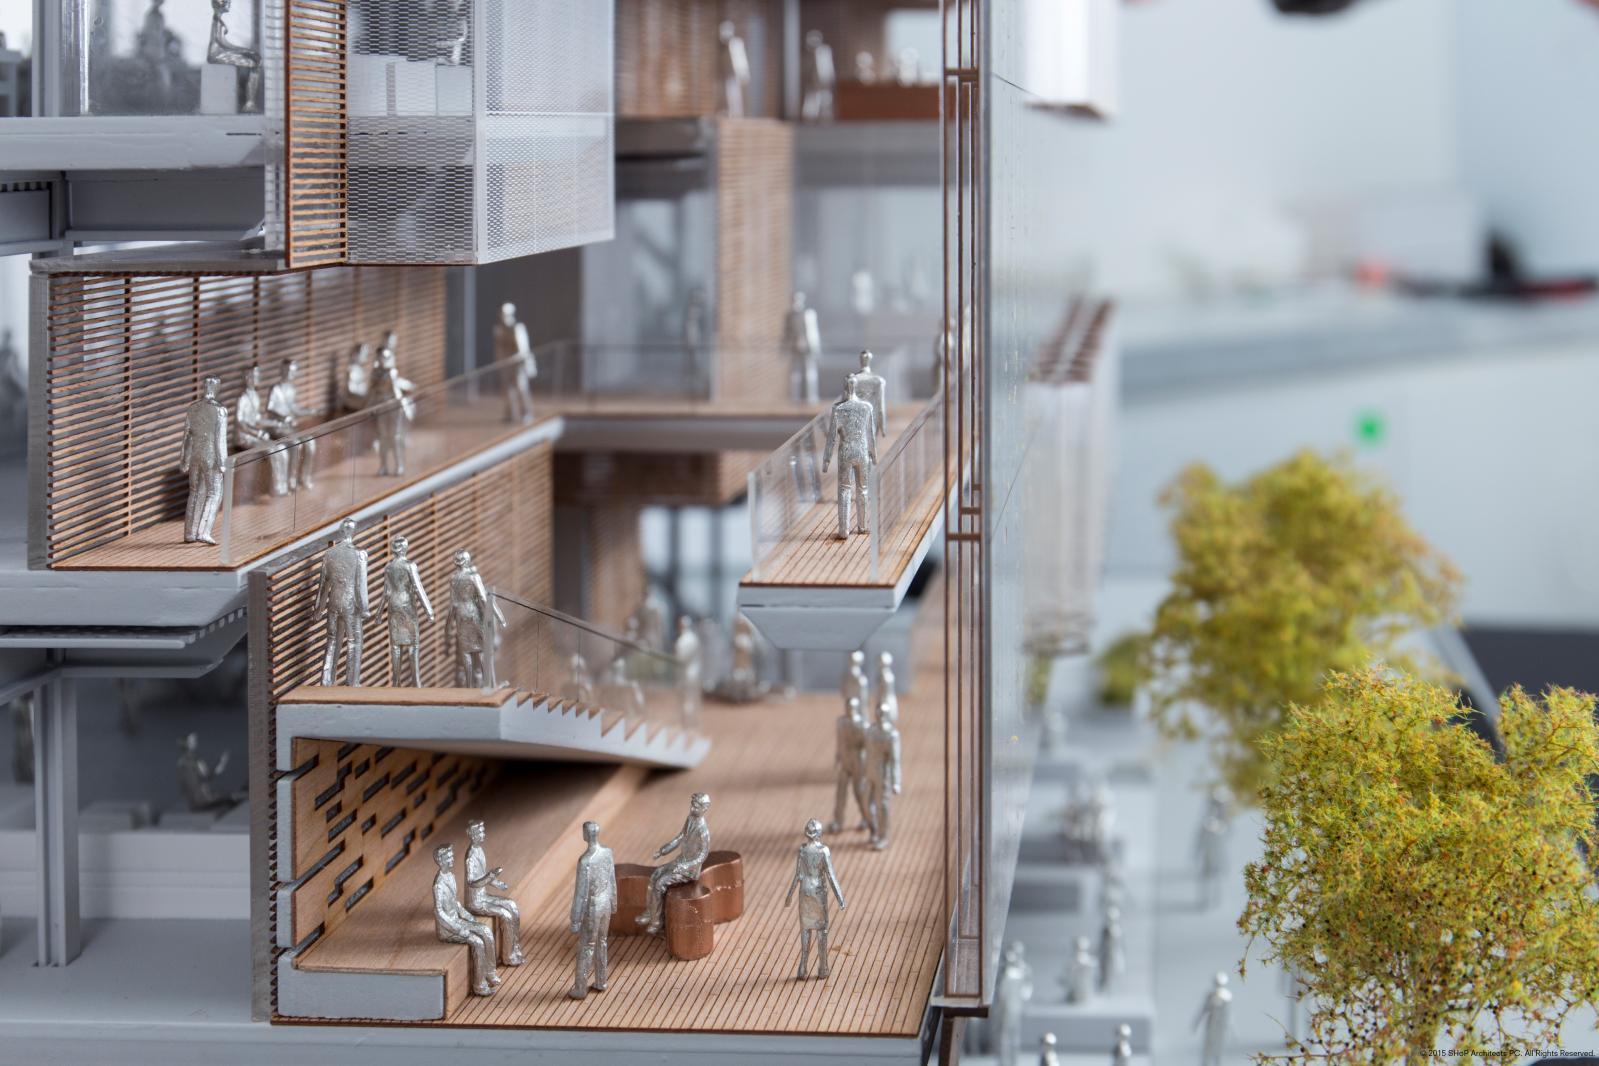 studio oa. Uber Headquarters By SHoP Architects And Studio O+A Oa